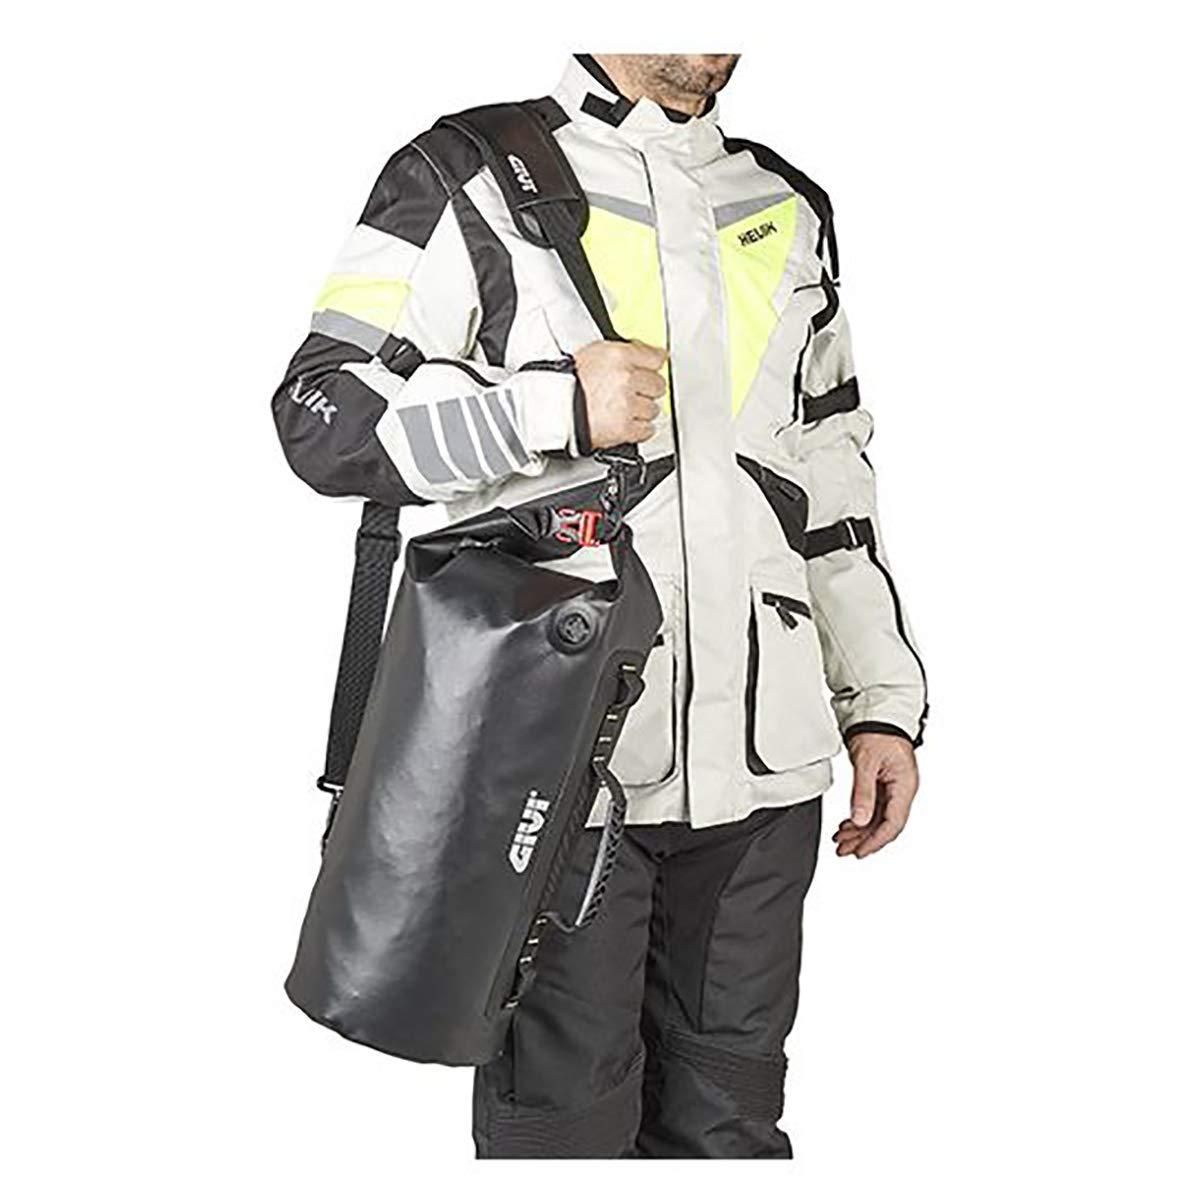 GIVI Roller Bag GRT714 WASSERDICHT 20 Liter